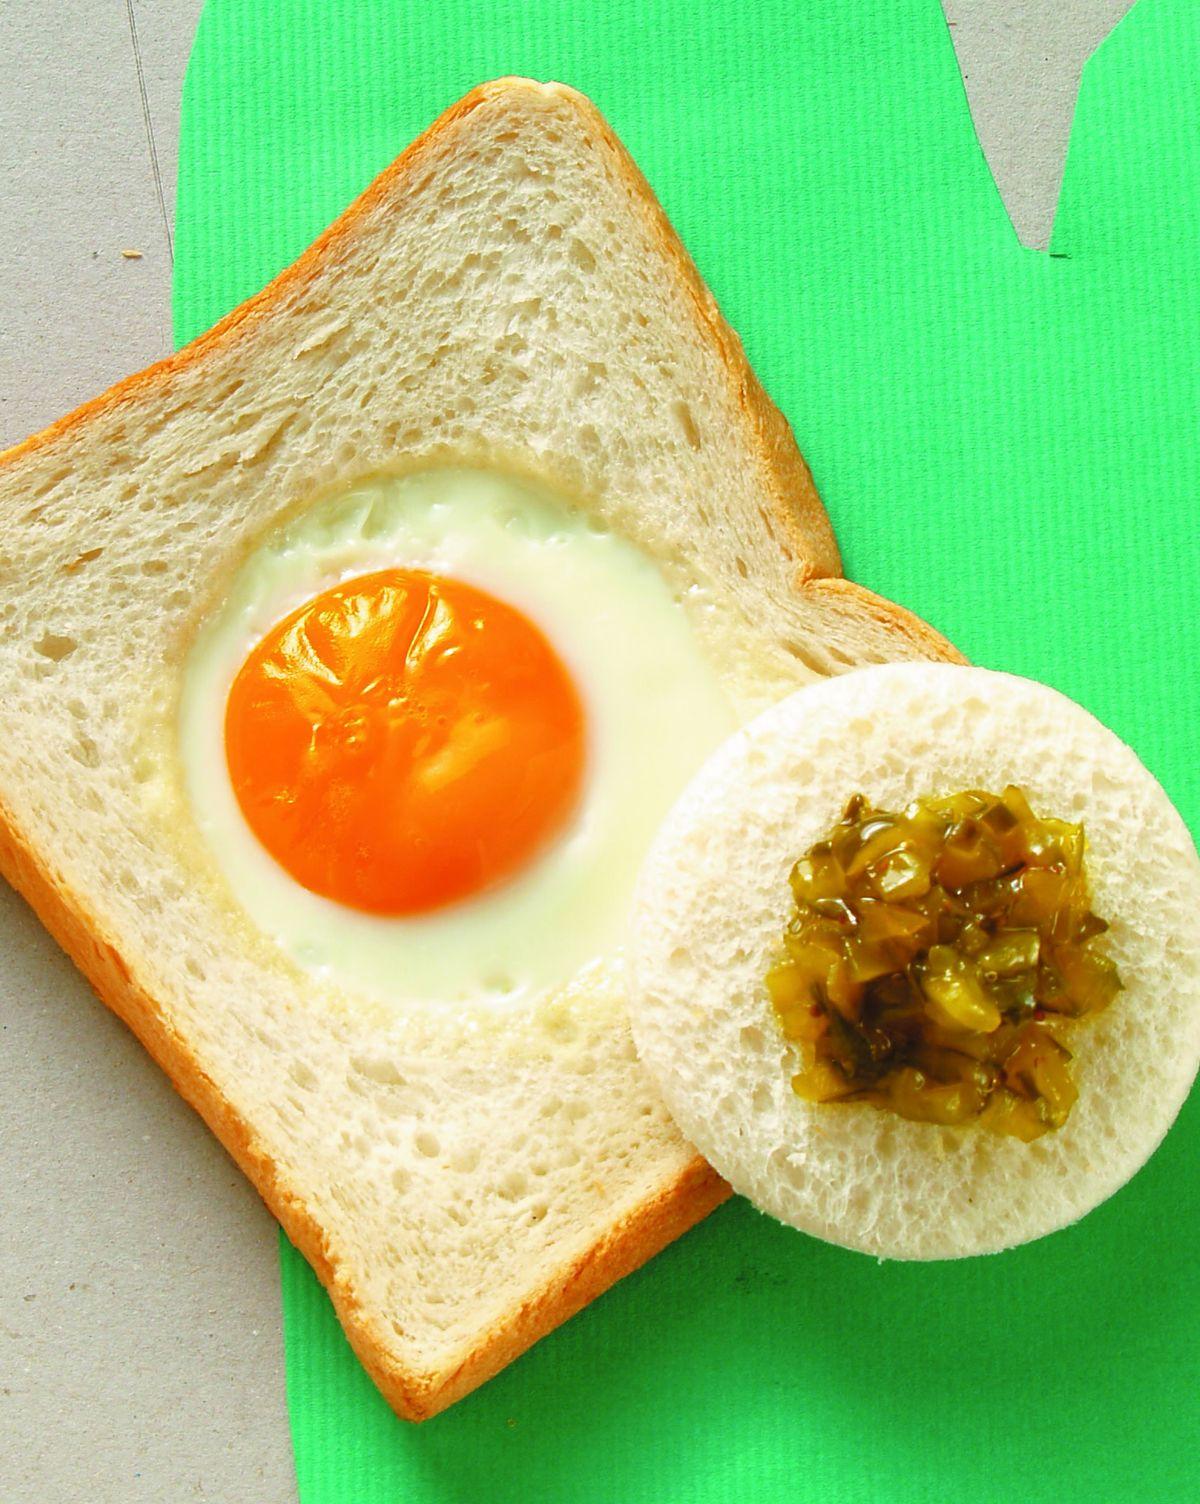 食譜:太陽蛋三明治